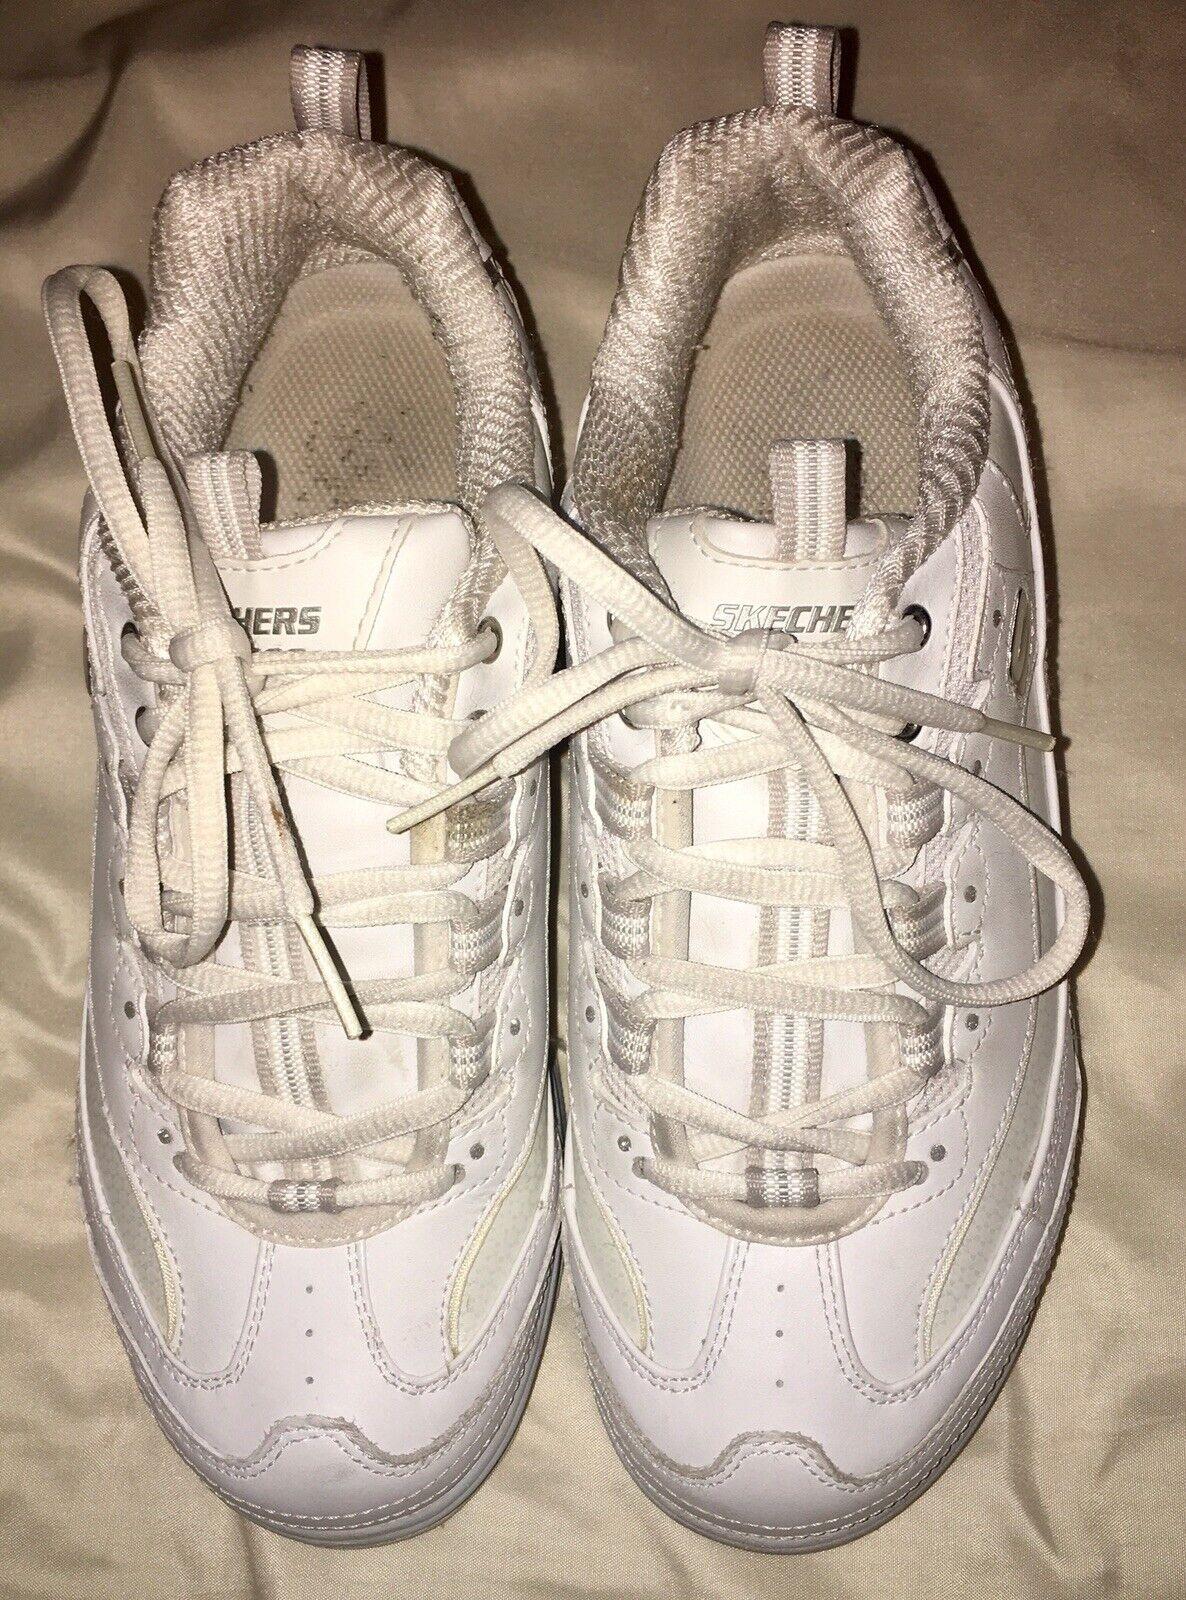 Sketchers Womens Size 8 Shape Ups  White Silver 11800 Walking Toning shoes